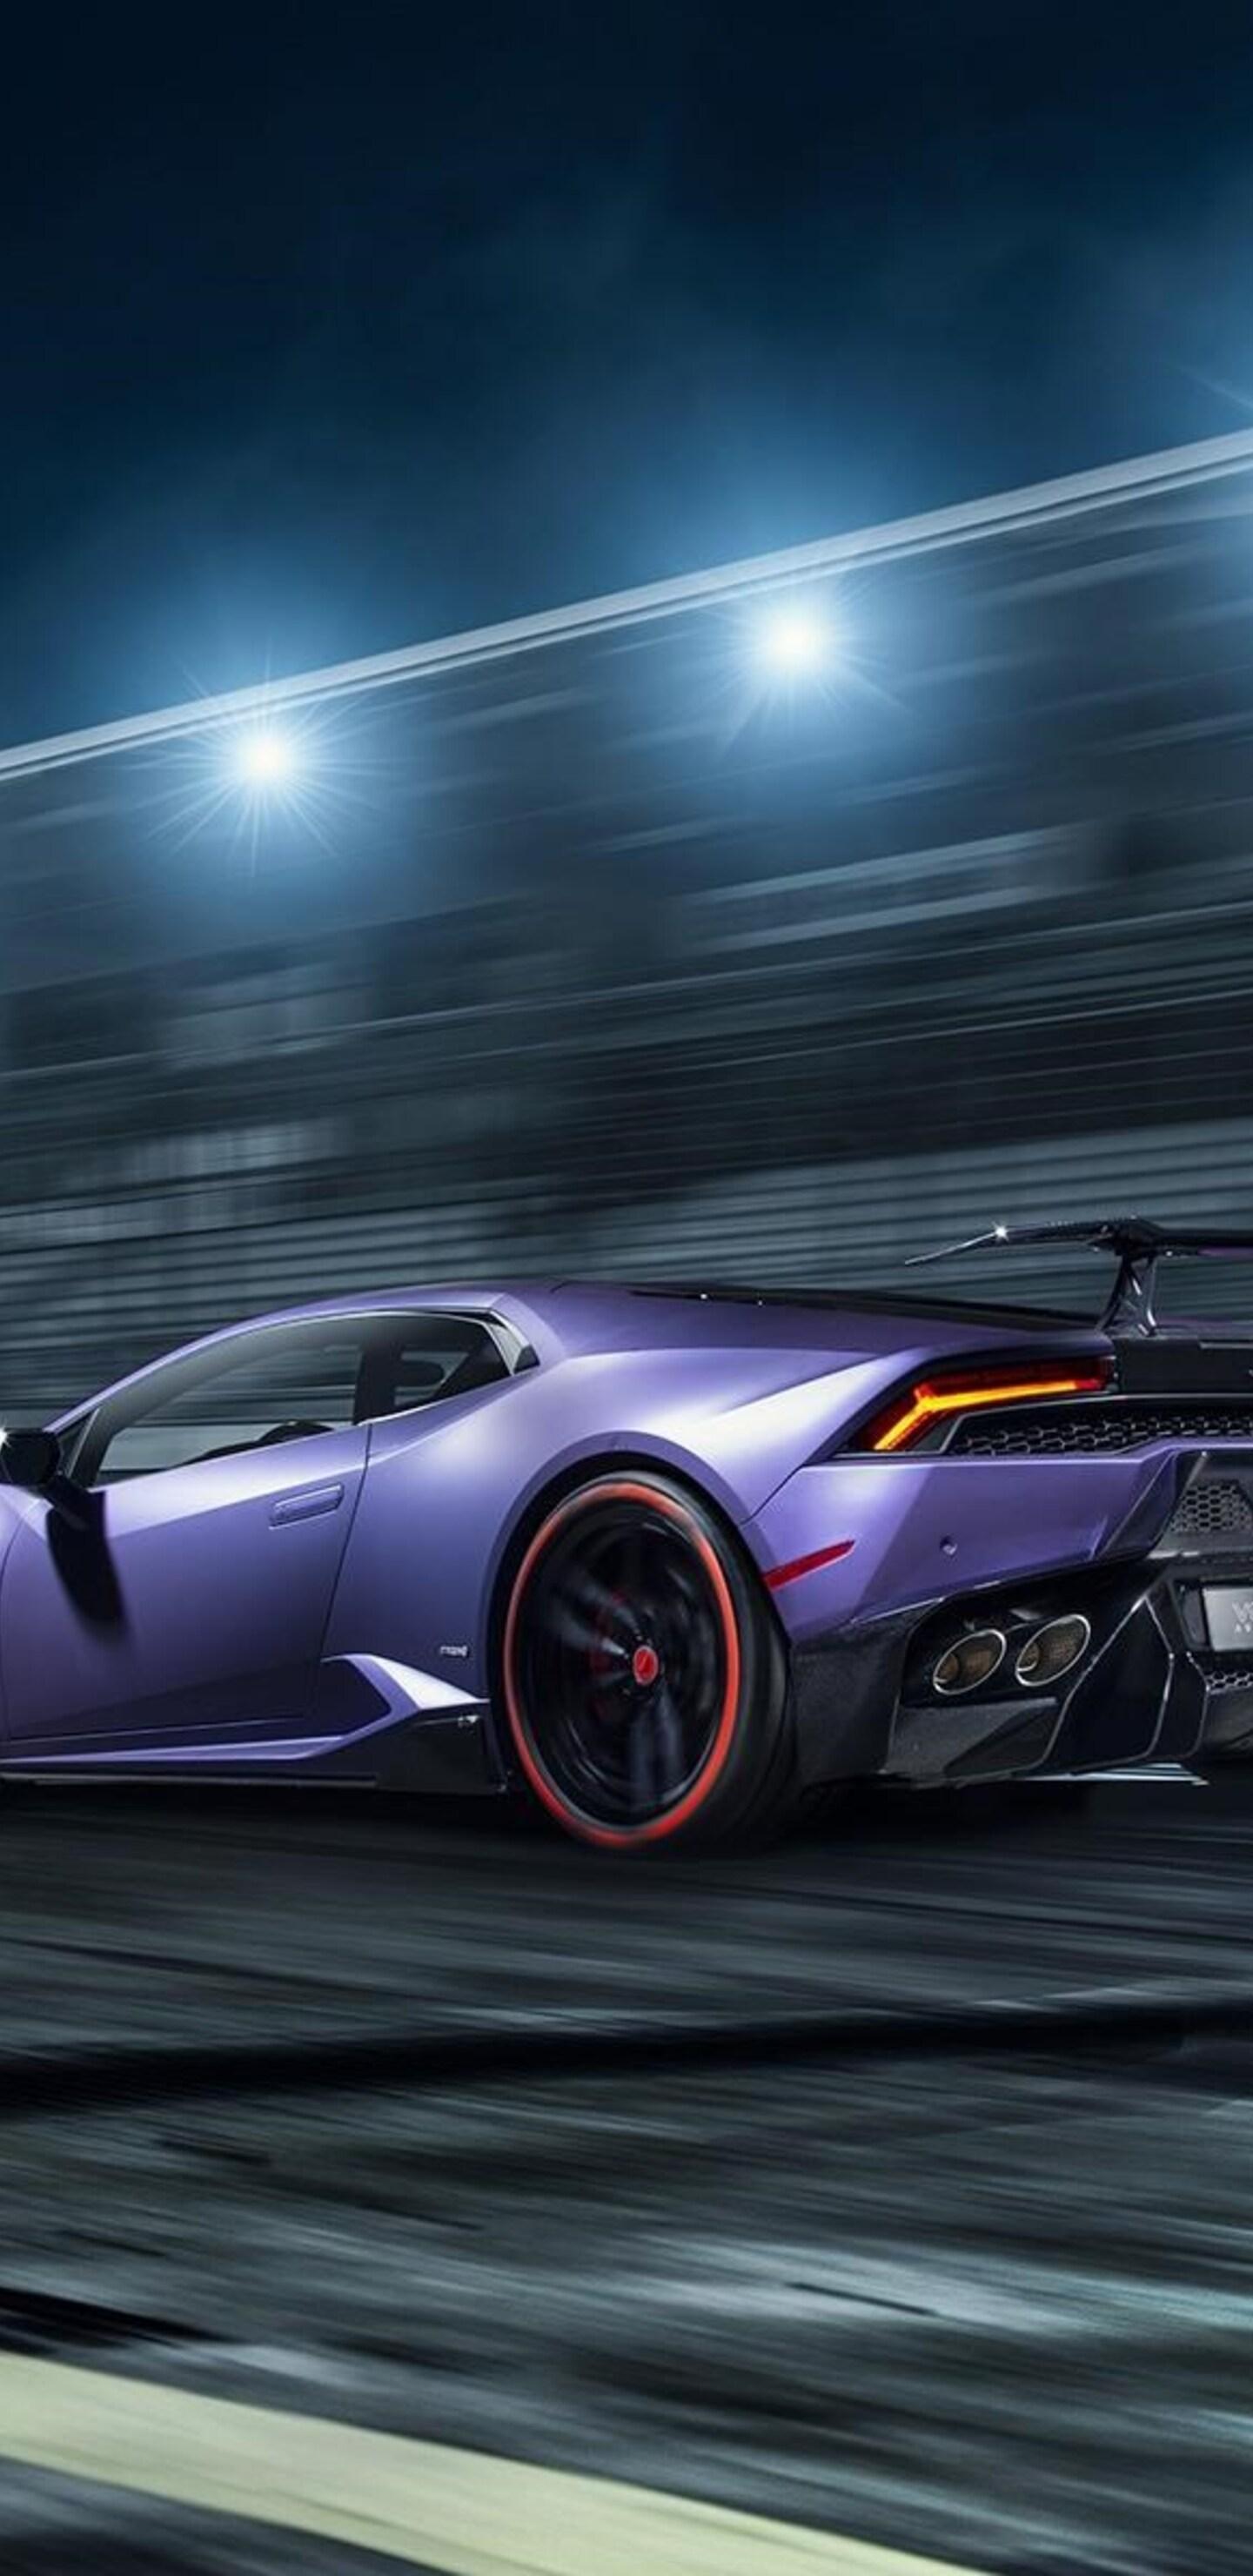 1440x2960 Lamborghini Huracan Super Car Samsung Galaxy Note 9 8 S9